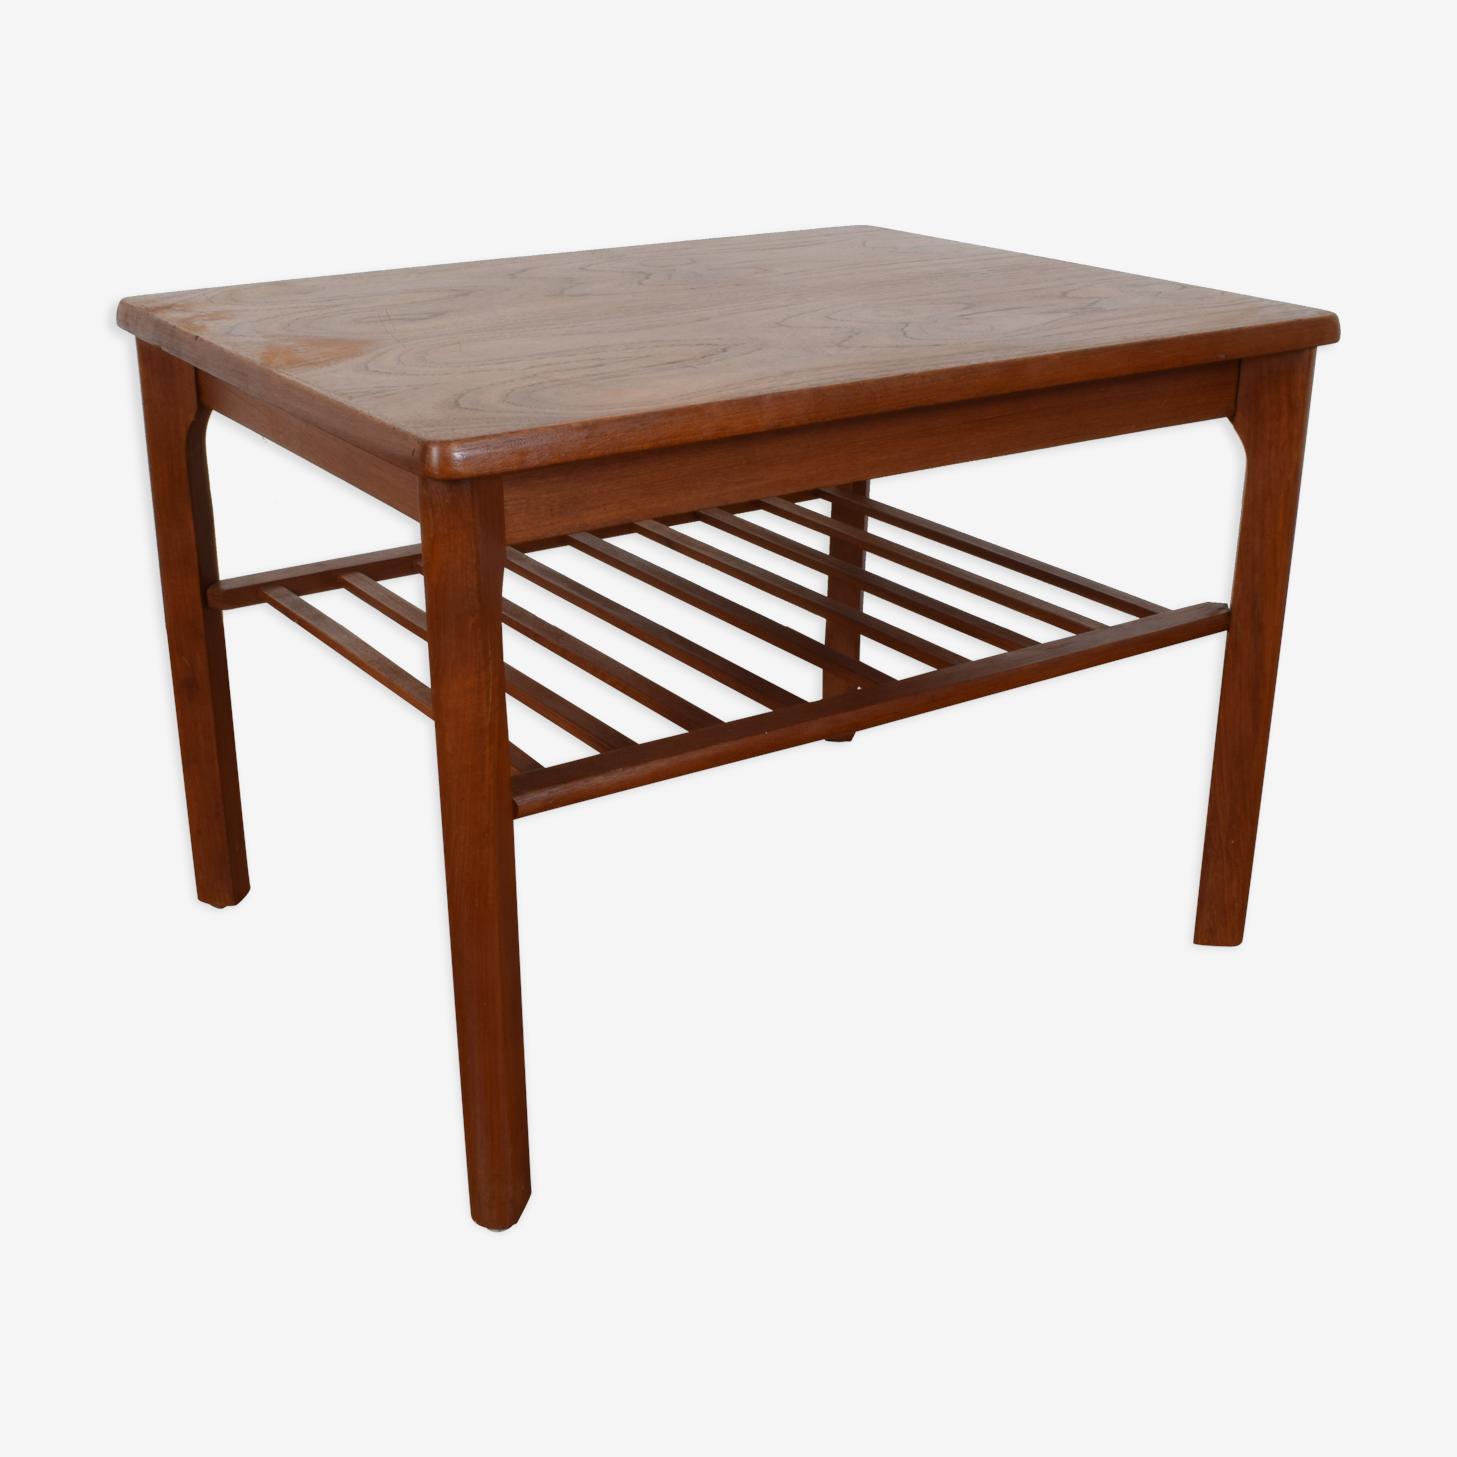 Table basse par Toften Møbelfabrikken 1960